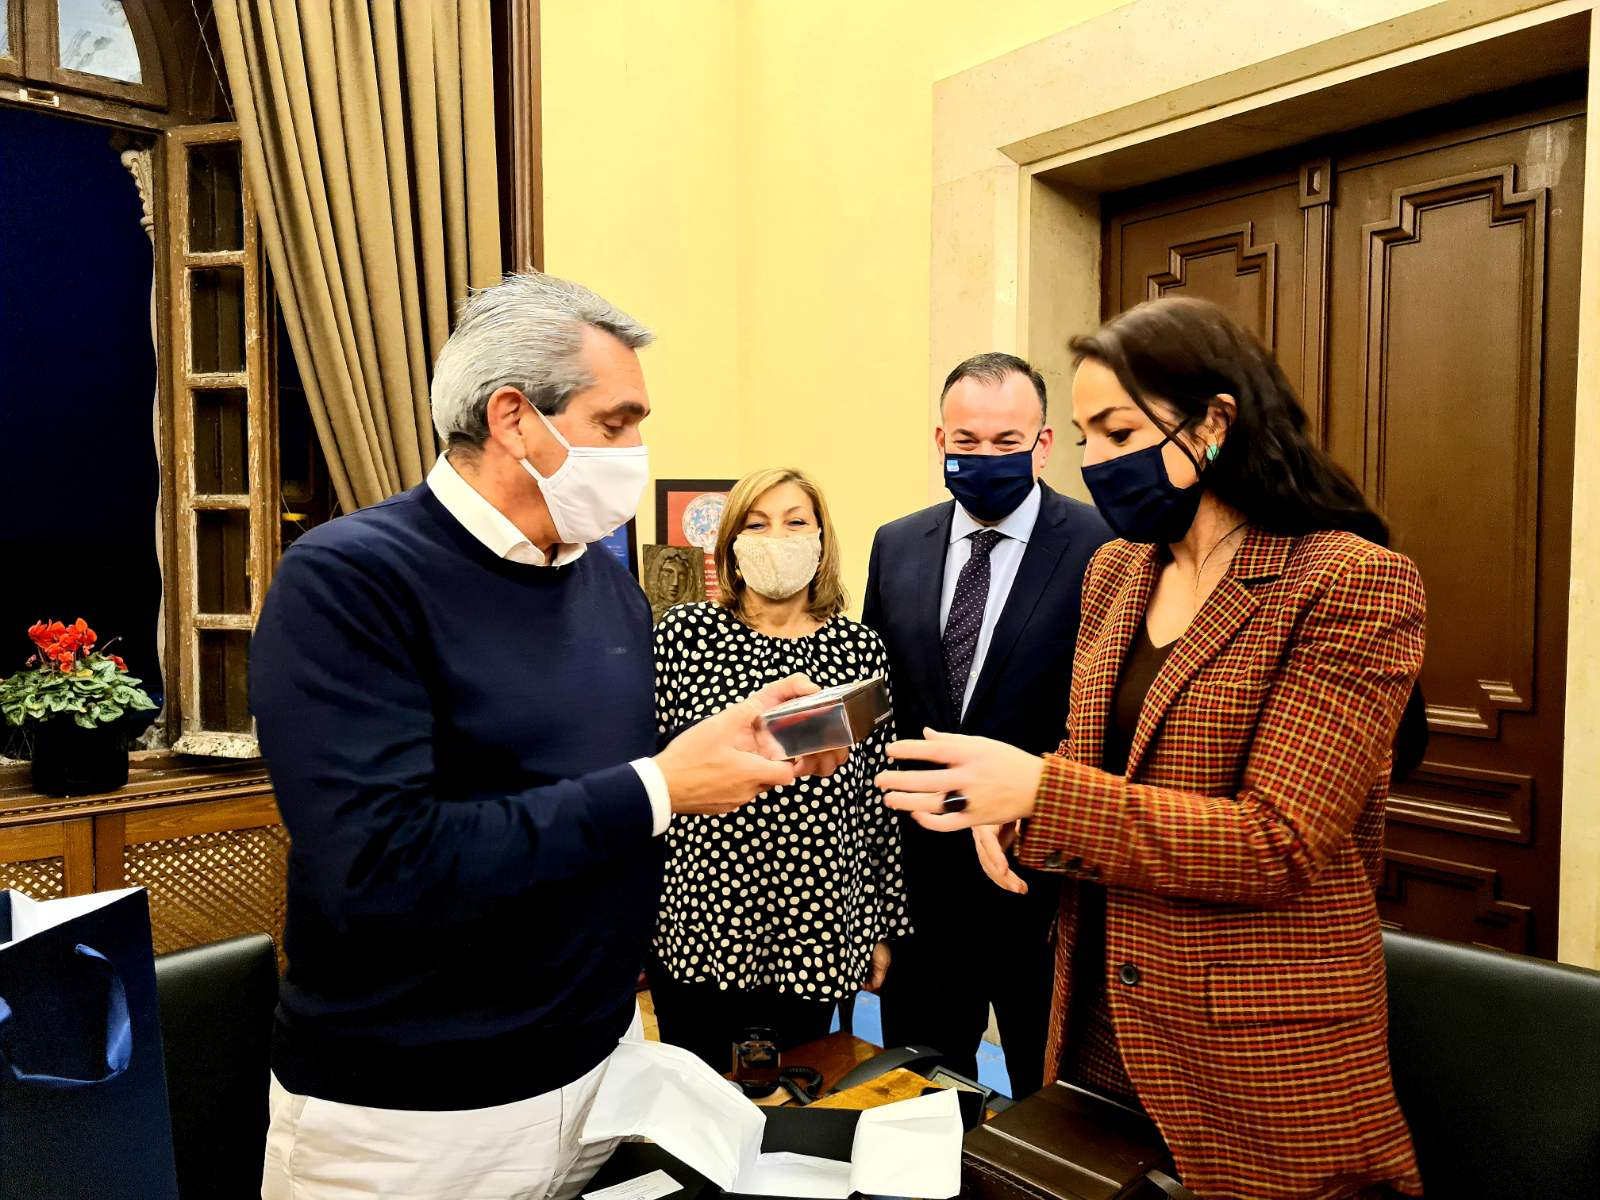 Eπίσκεψη της Υφυπουργού Εργασίας και Κοινωνικών Υποθέσεων, Δόμνας Μιχαηλίδου στην Περιφέρεια Νοτίου Αιγαίου